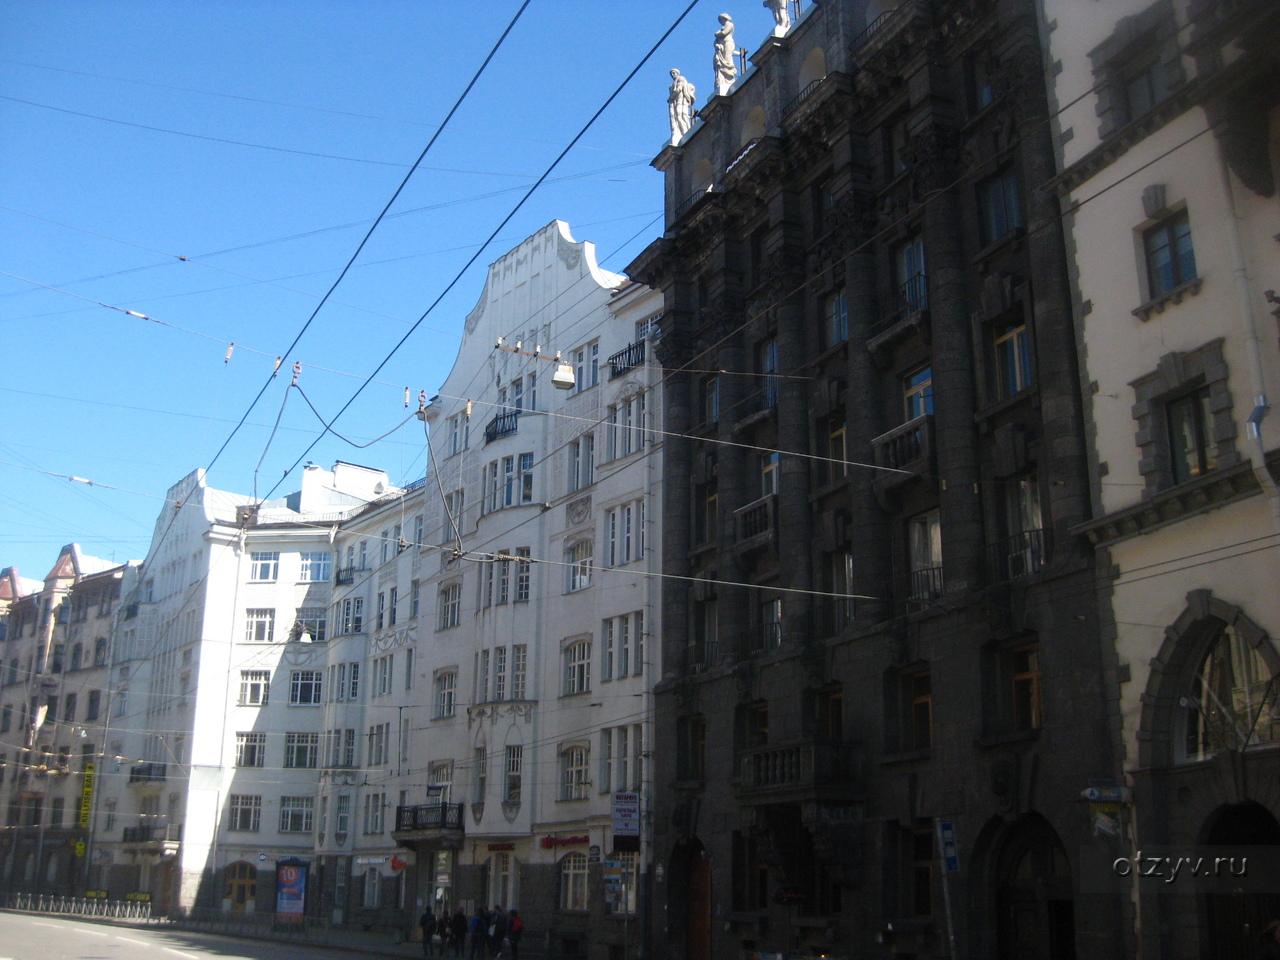 intim-uslugi-petrogradskiy-rayon-s